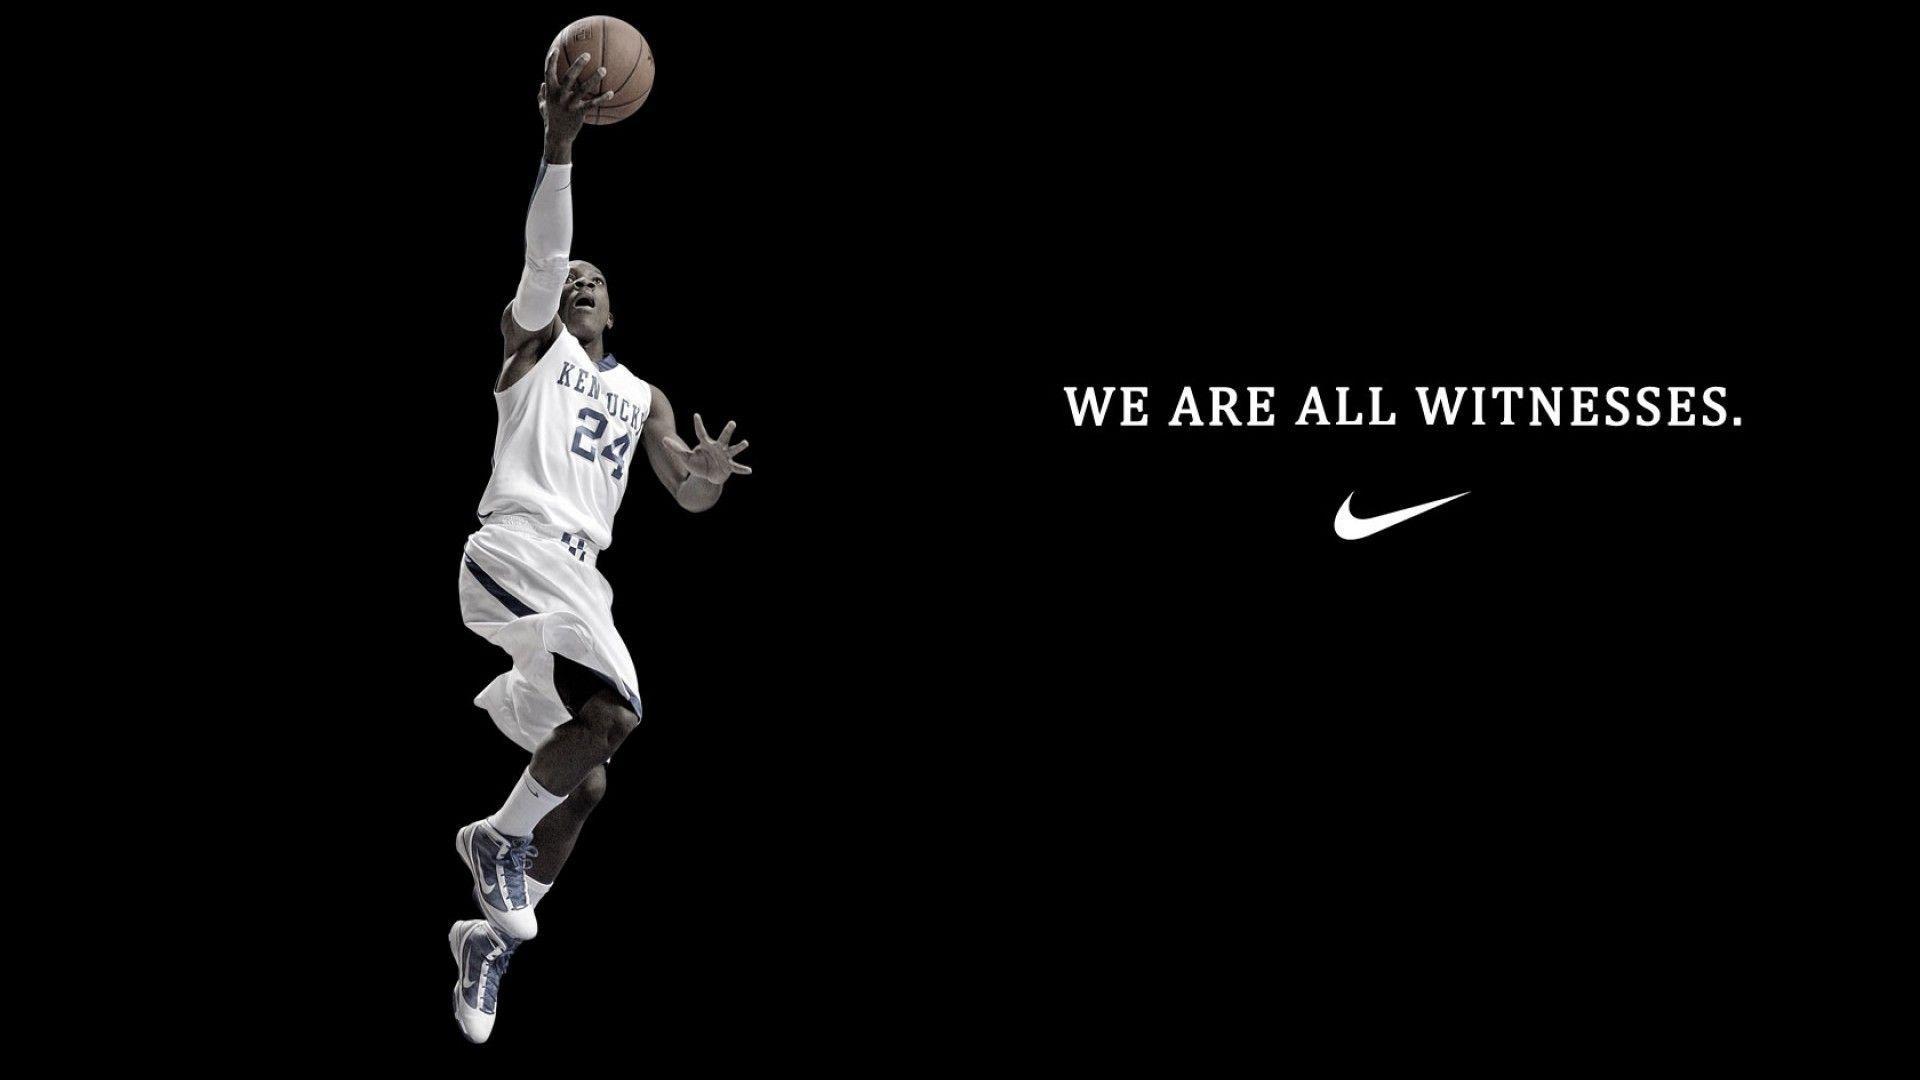 Nike Basketball Wallpapers Top Free Nike Basketball Backgrounds